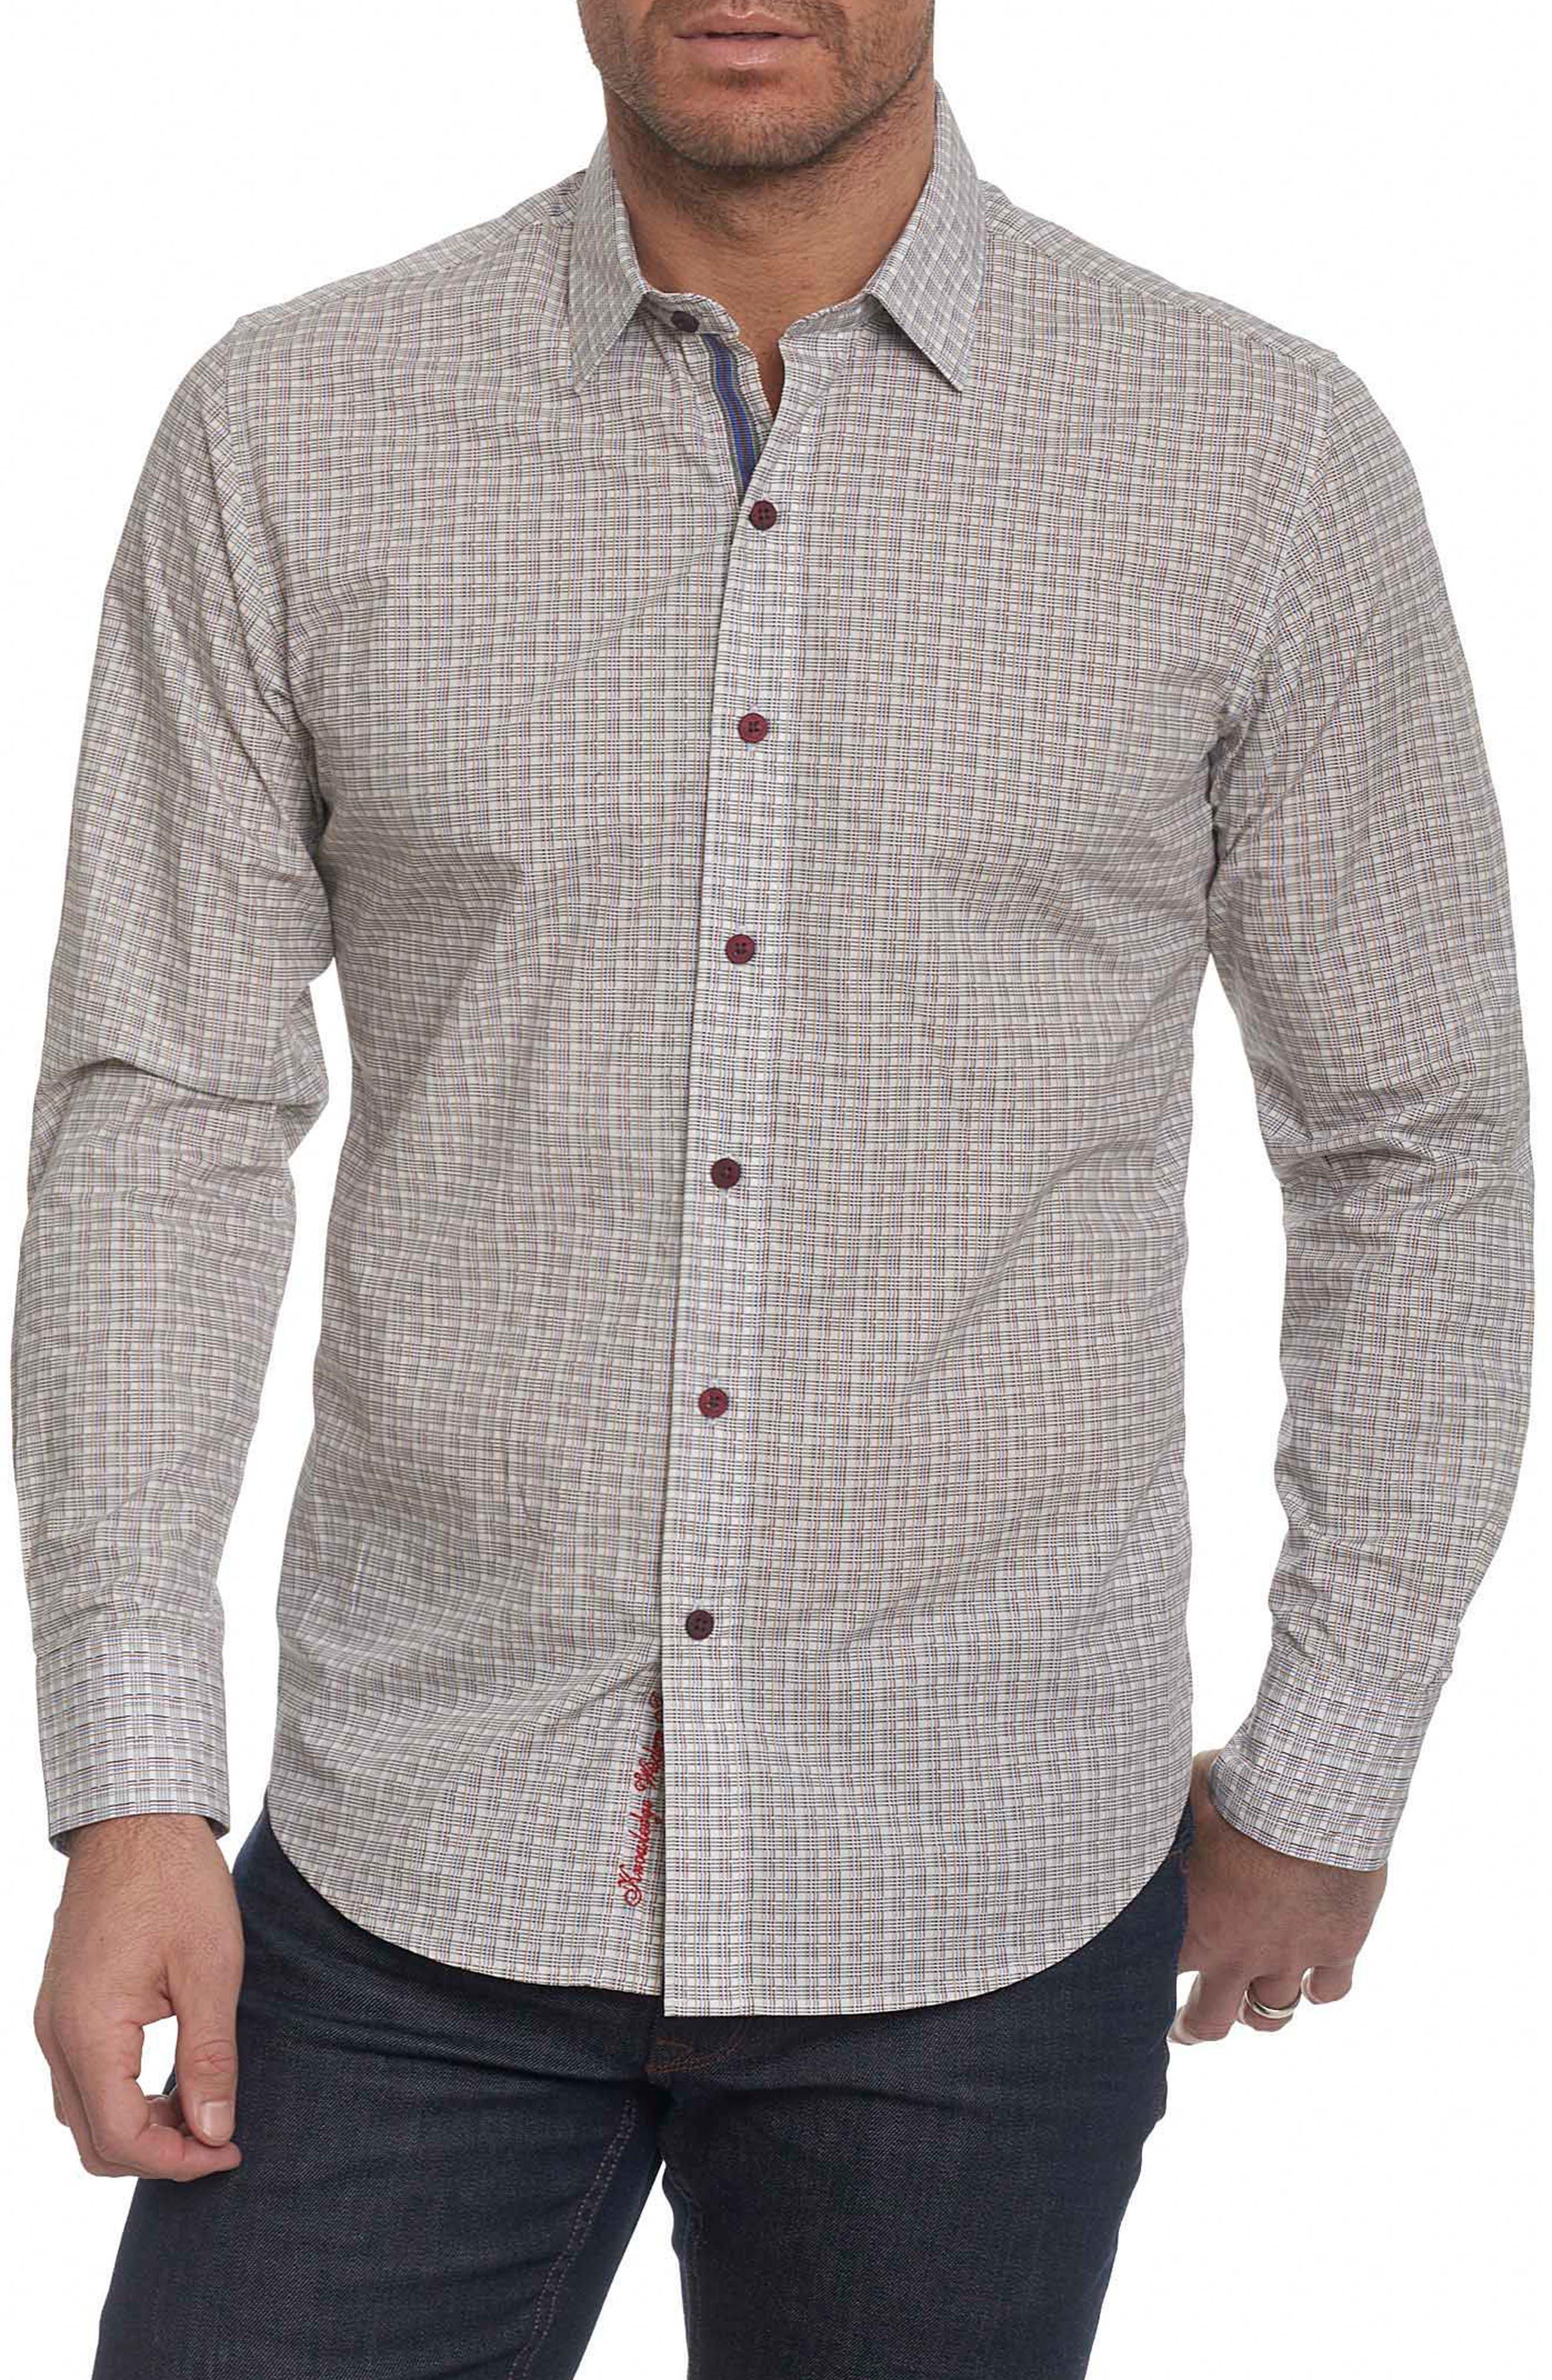 Sandy Creek Classic Fit Sport Shirt,                             Main thumbnail 1, color,                             110